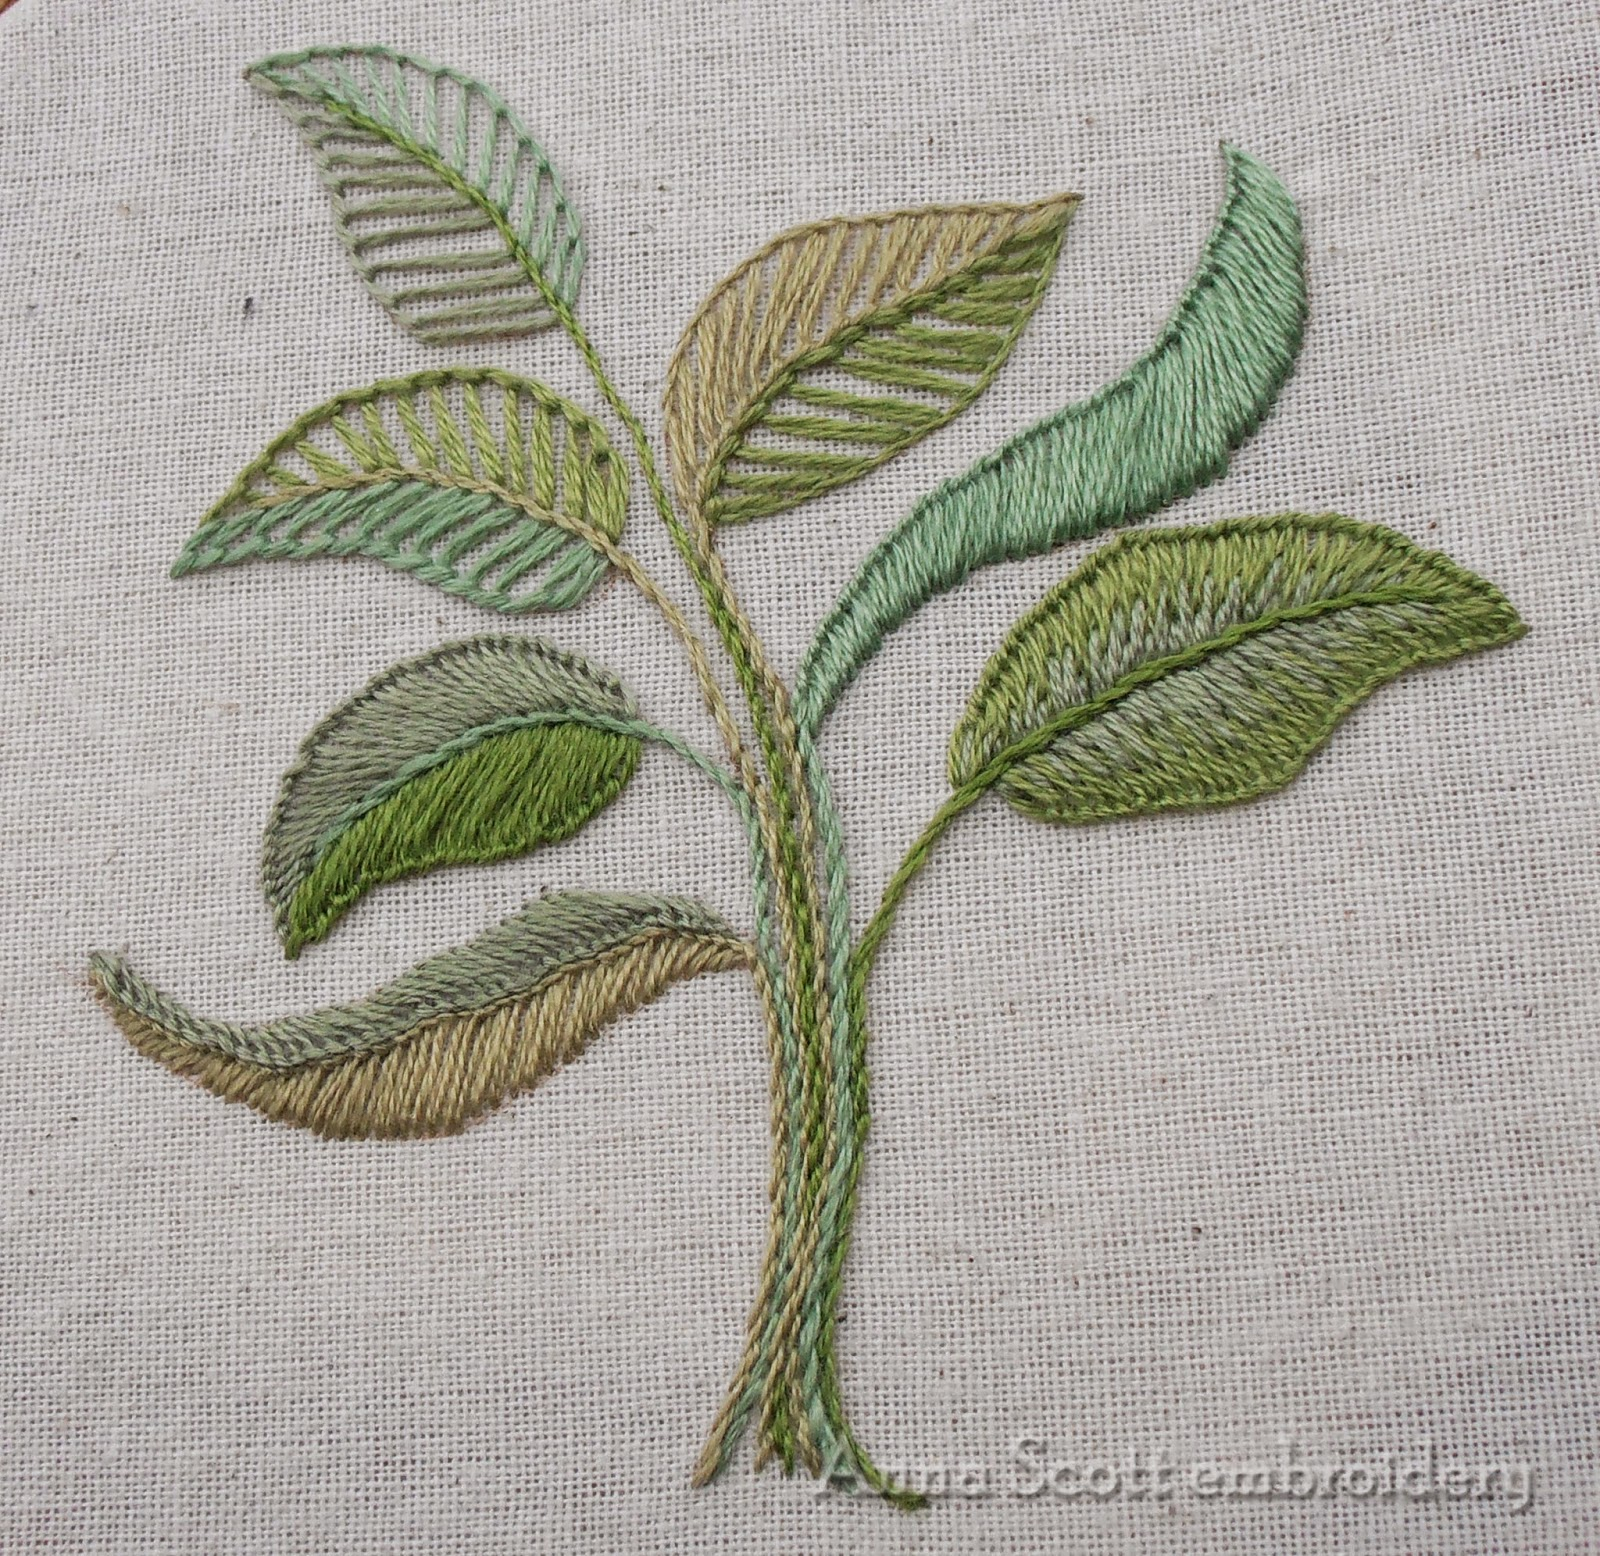 Anna scott blanket stitch leaves part two